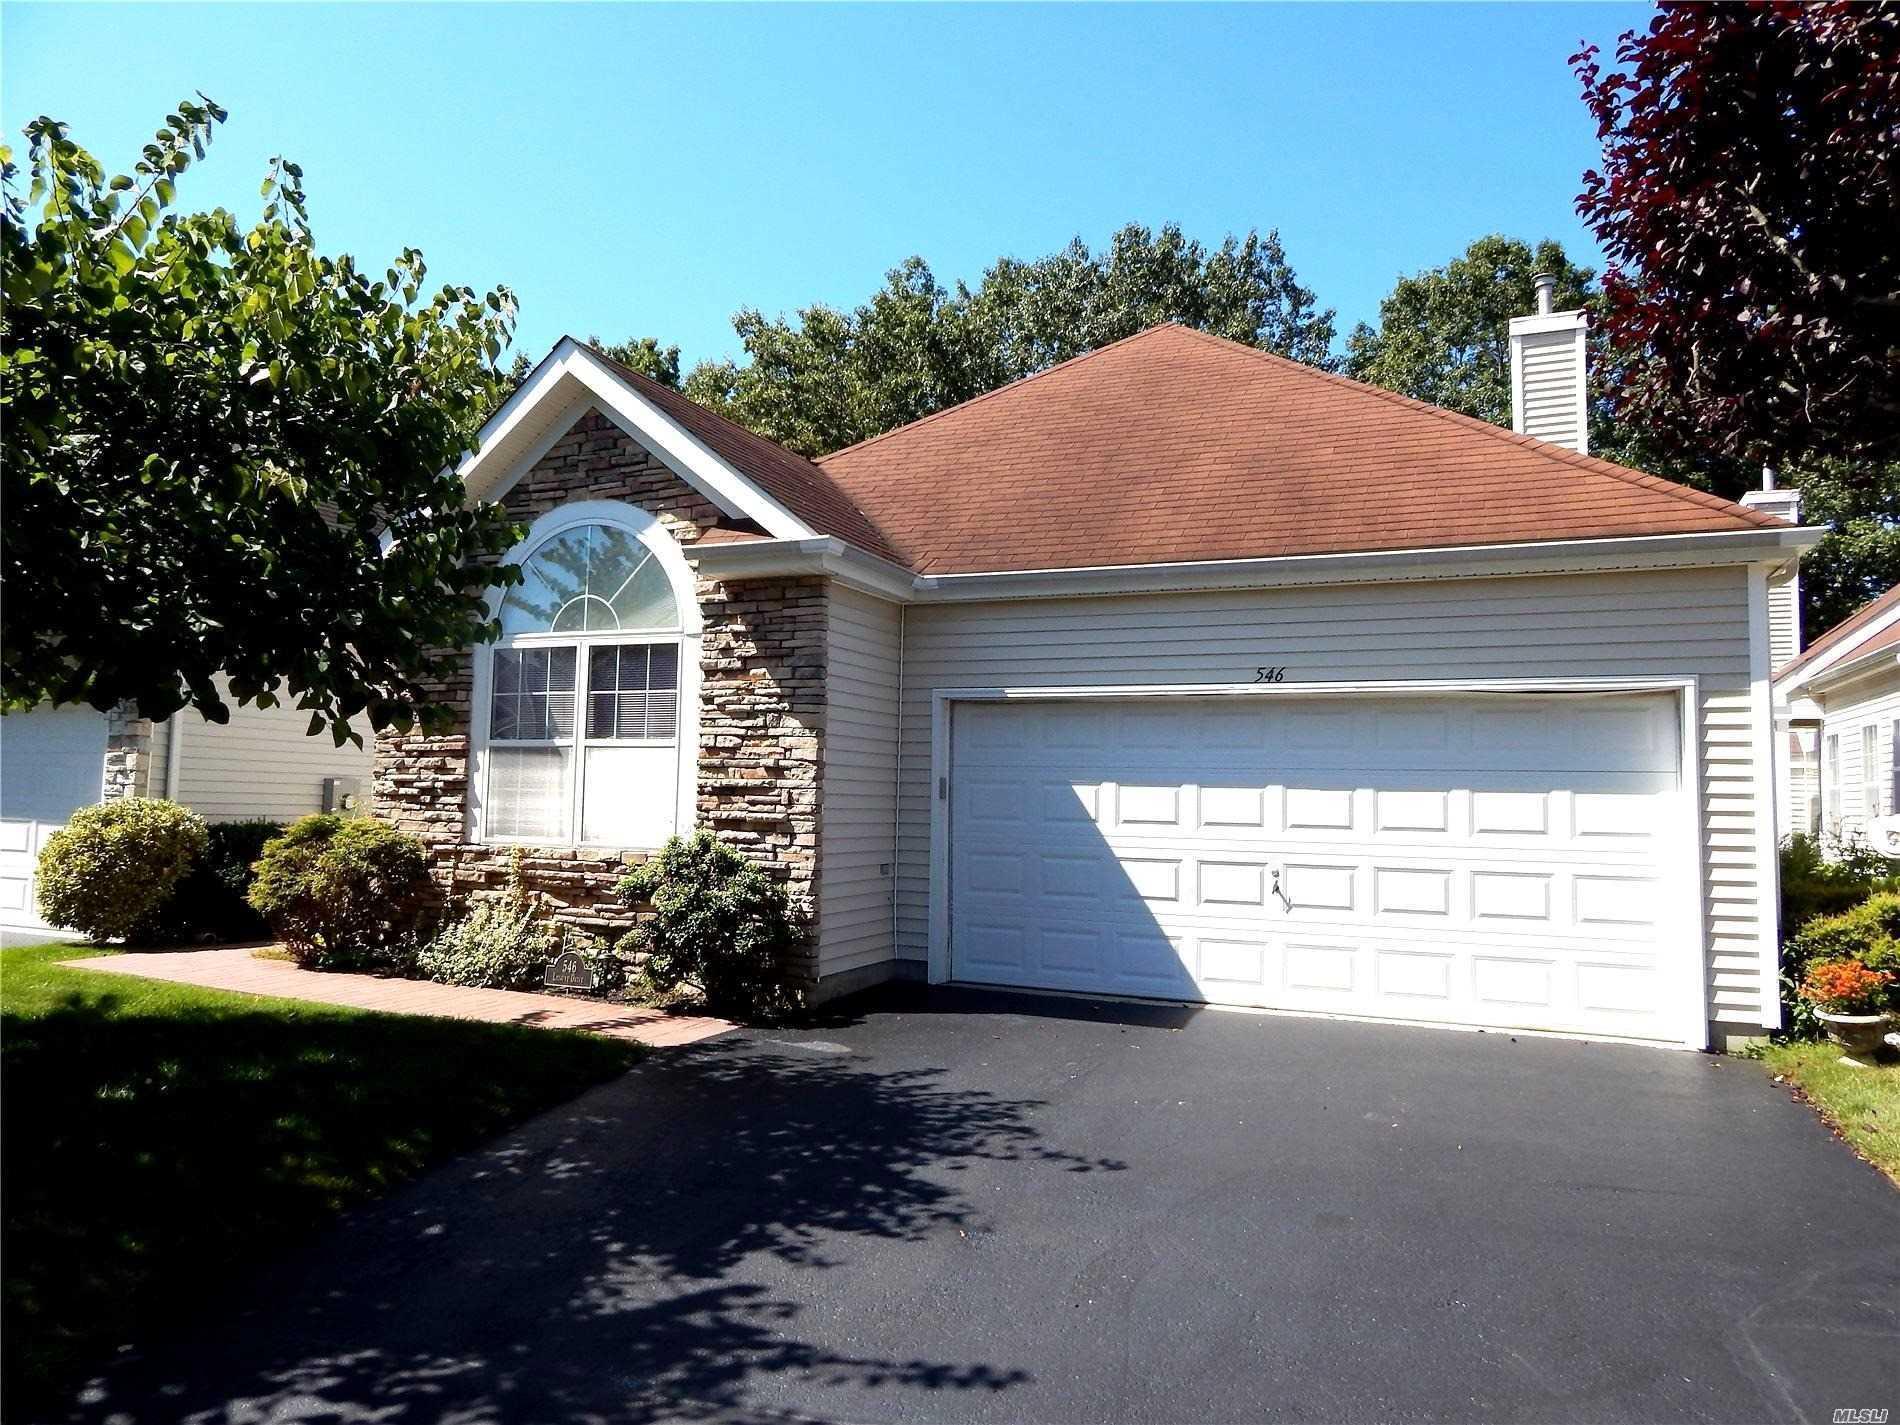 Property for sale at 546 Leisure Drive, Ridge NY 11961, Ridge,  New York 11961